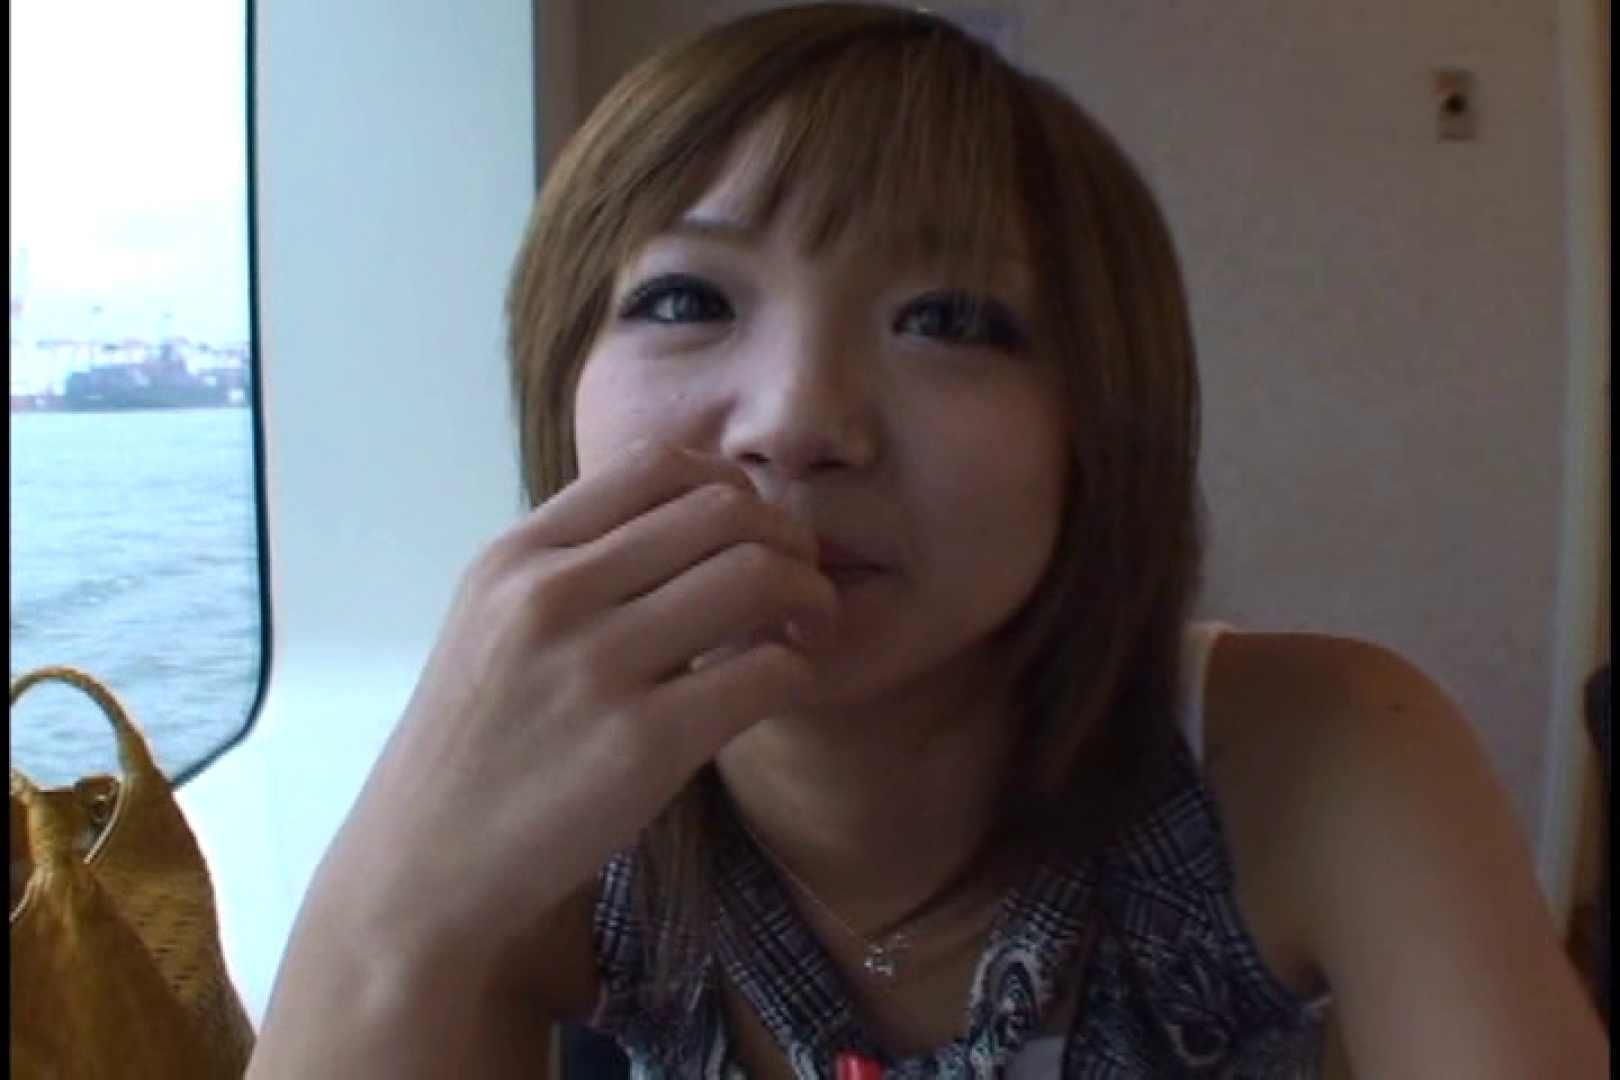 JDハンター全国ツアー vol.029 前編 女子大生のエロ動画  79PIX 36